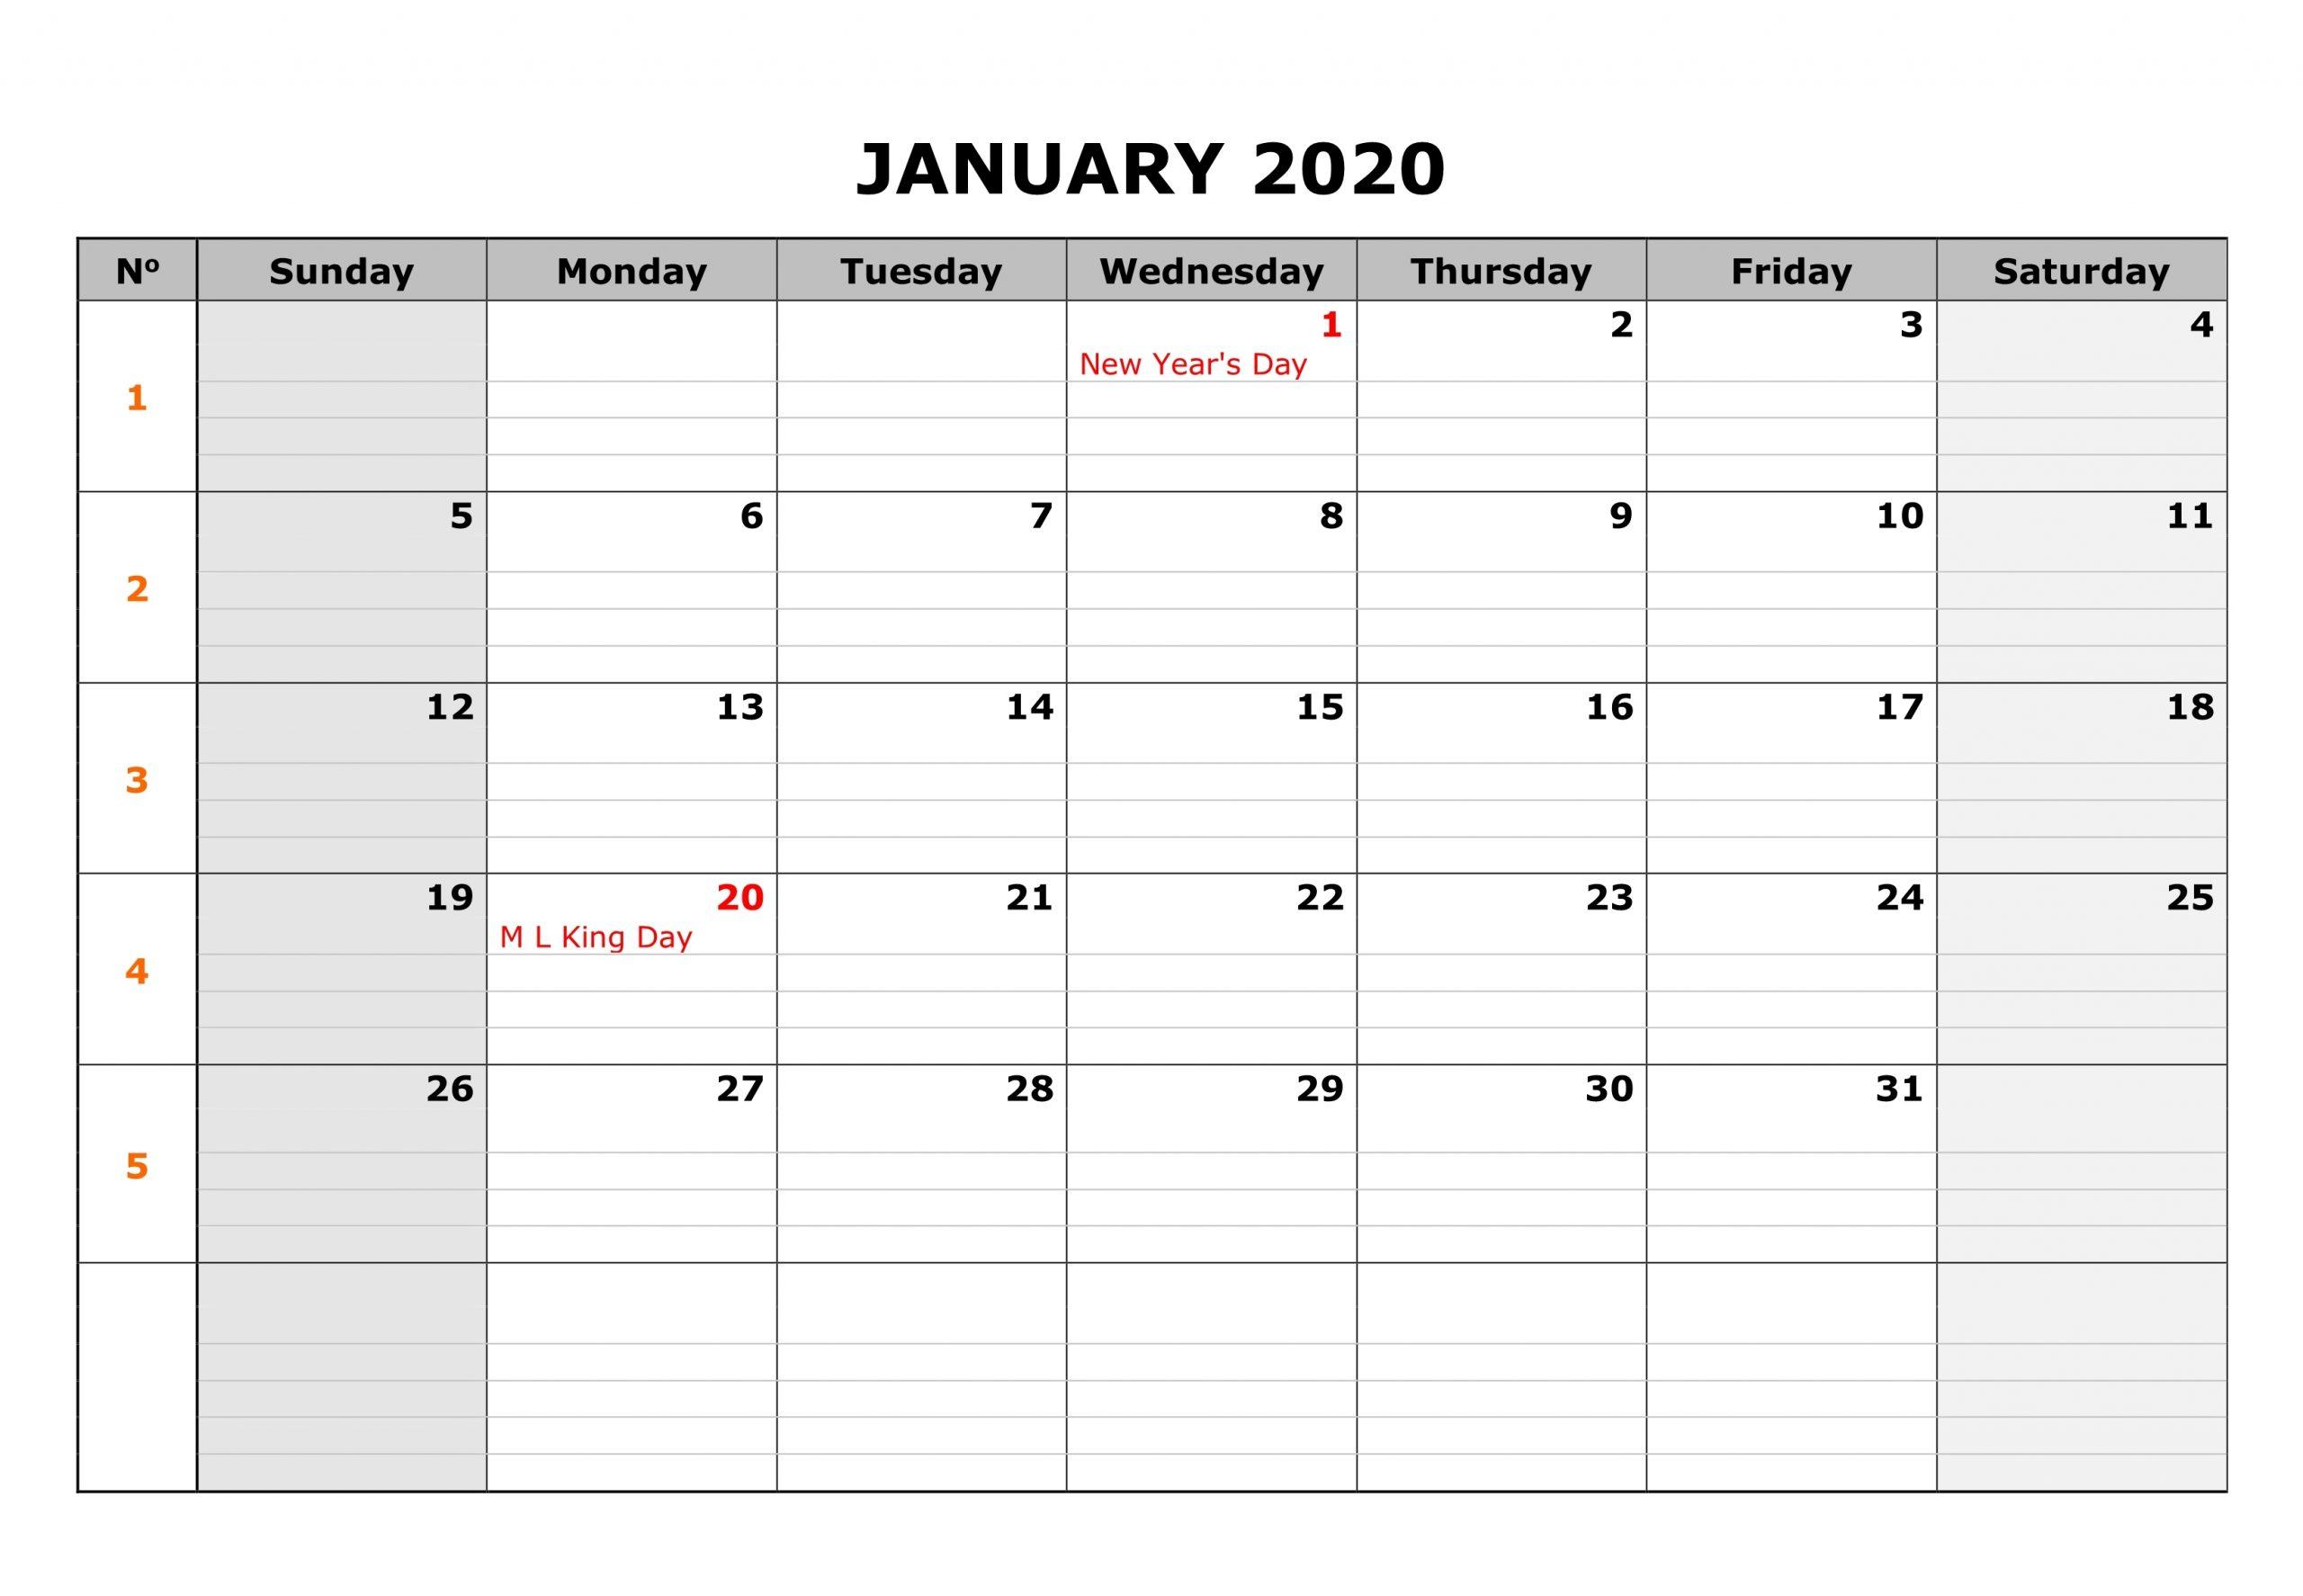 January 2020 Calendar Pdf, Word, Excel Printable Templates